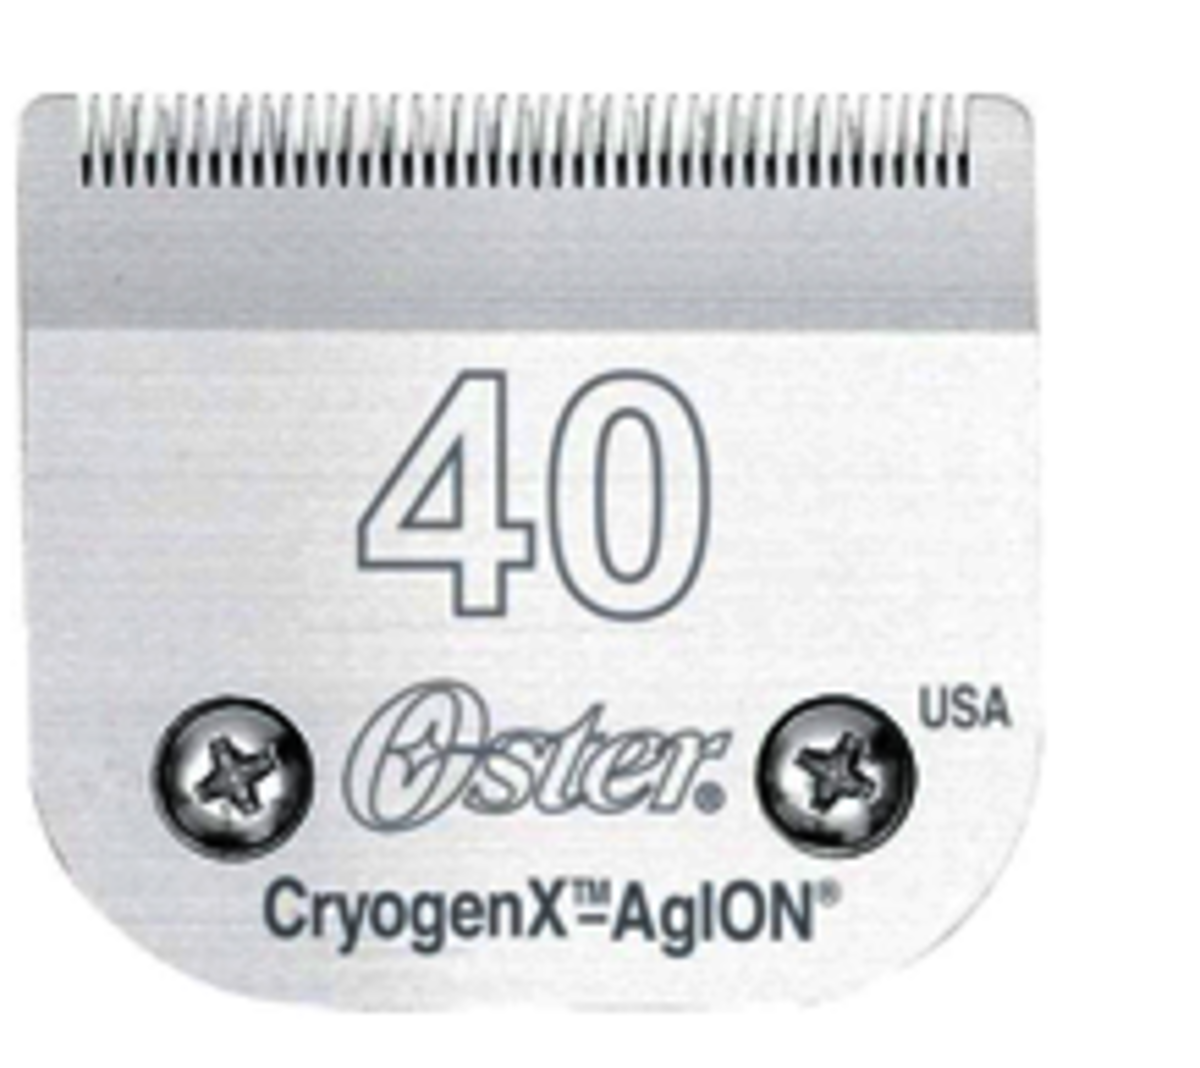 Oster CryogenX #40 Blade